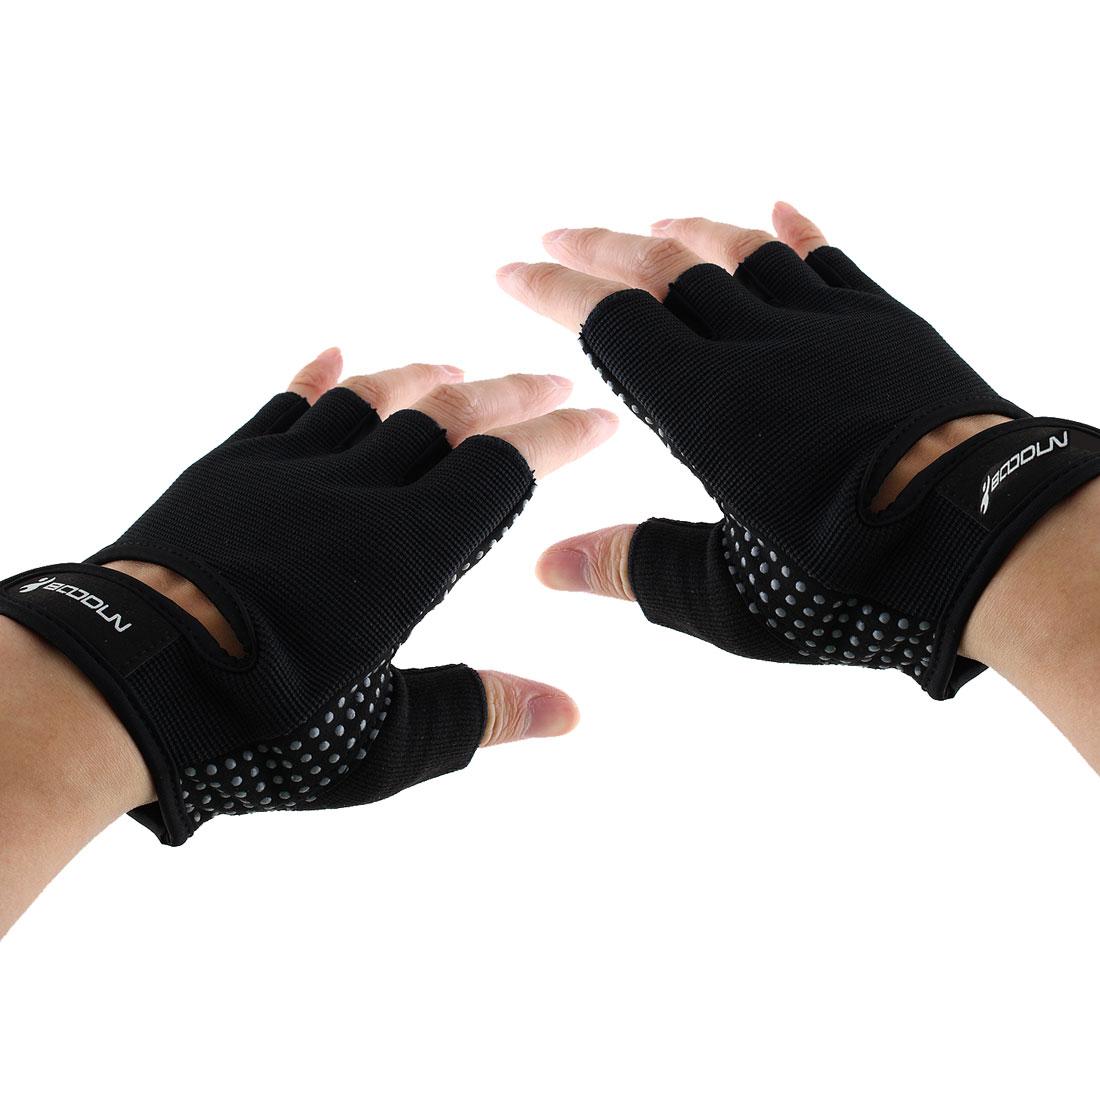 BOODUN Authorized Adult Unisex Spandex Adjustable Sports Training Workout Mittens Fitness Gloves Black XL Pair